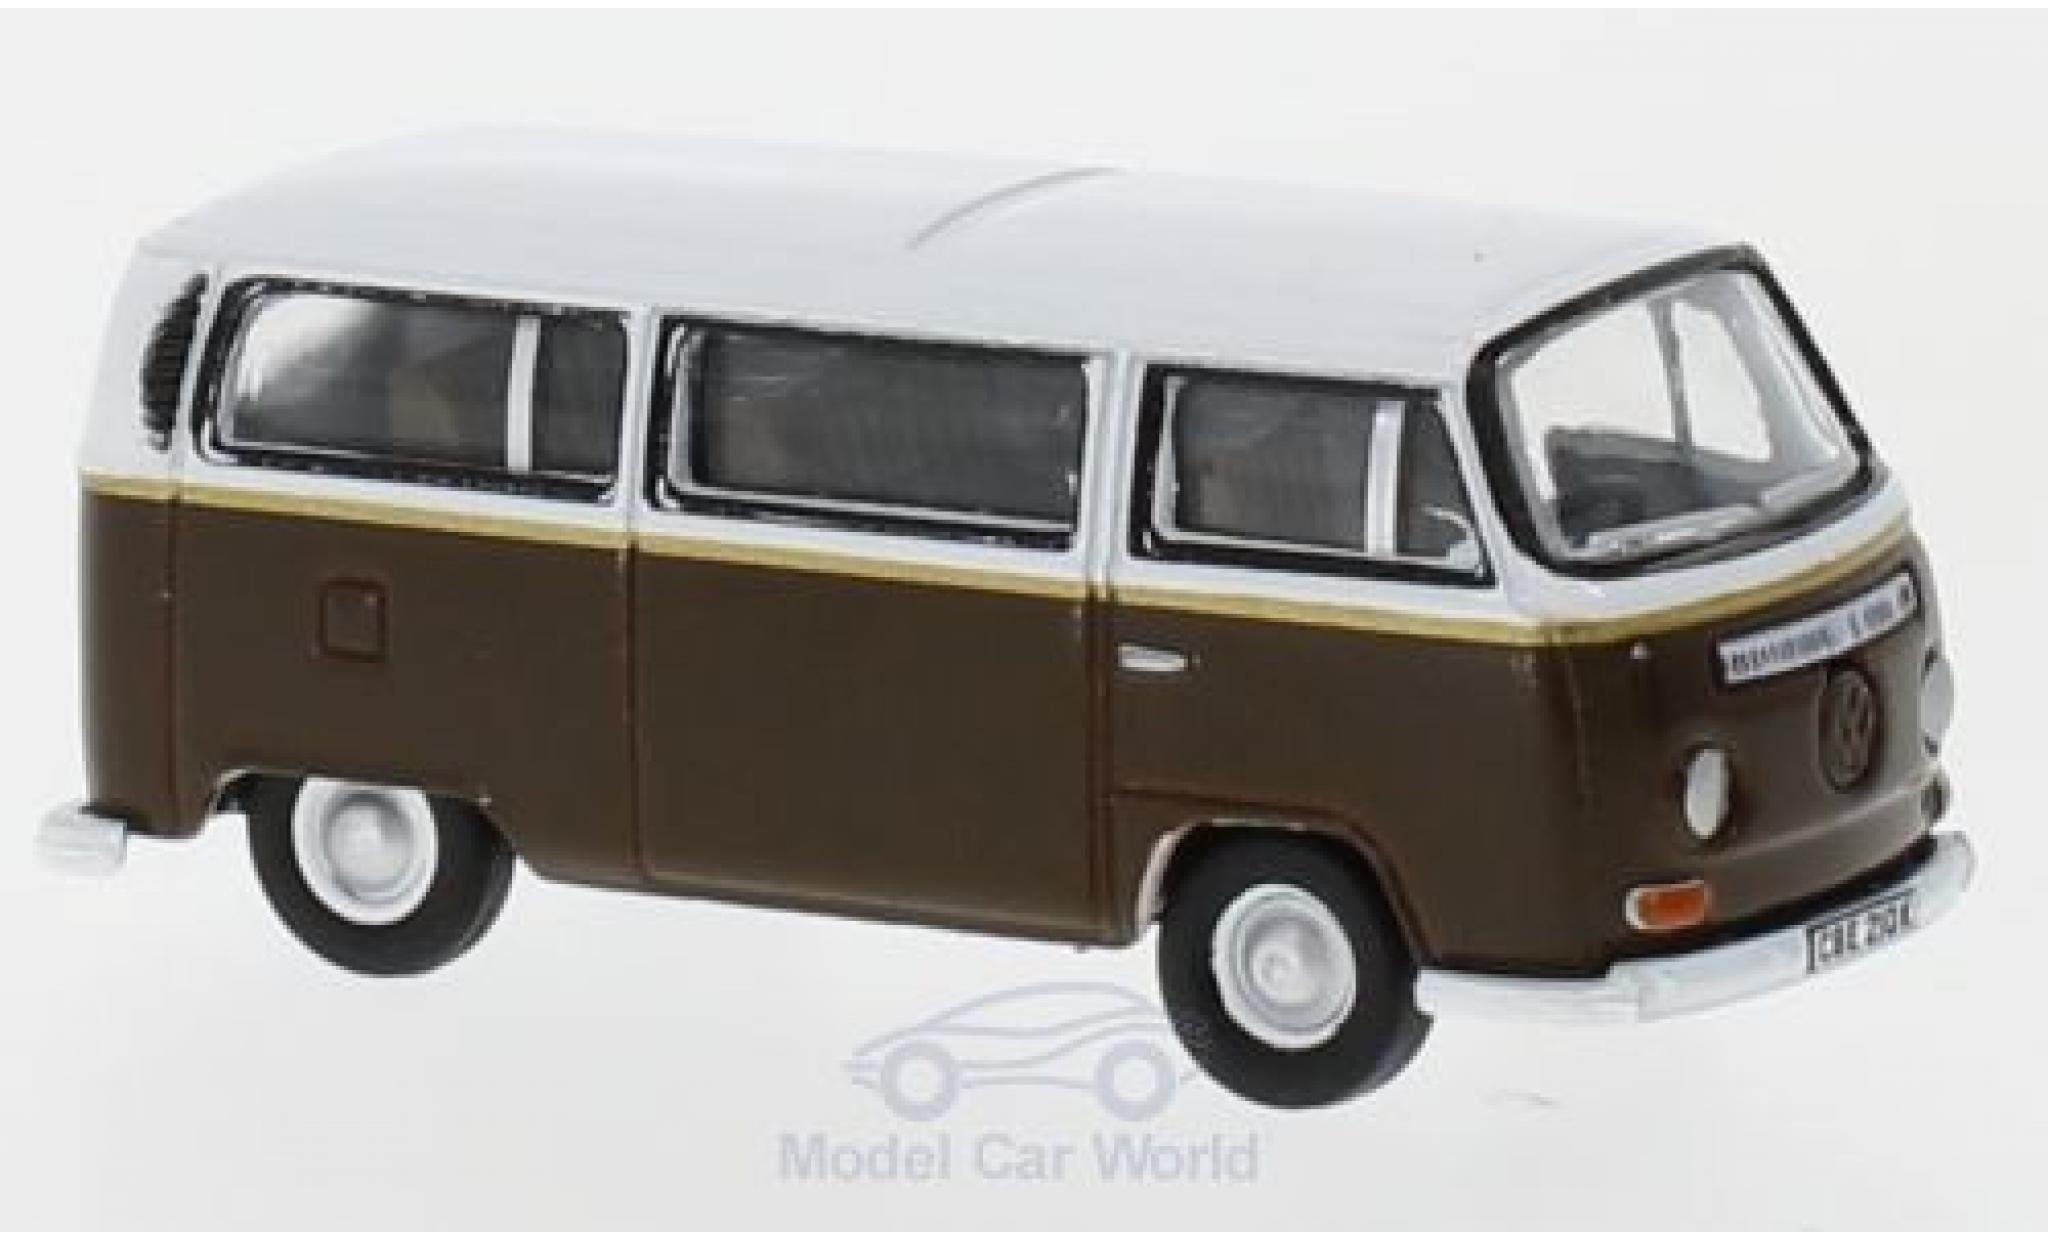 Volkswagen T2 B 1/76 Oxford Bay Window dunkelmarron/blanche Auf Wiedersehn Pet